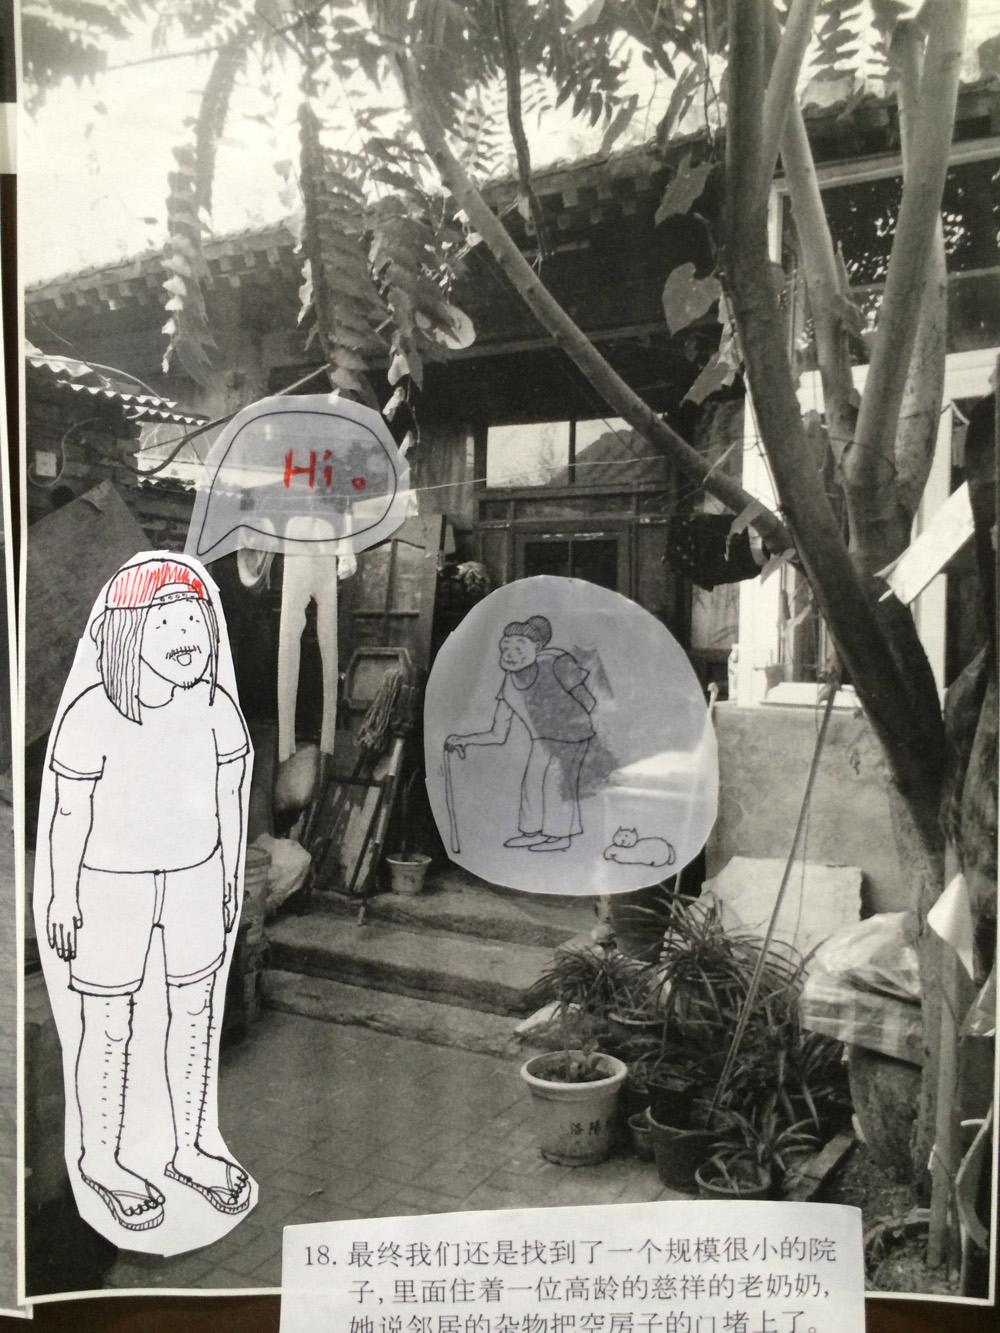 Caopu-humble-hostel-story-hisheji (18)